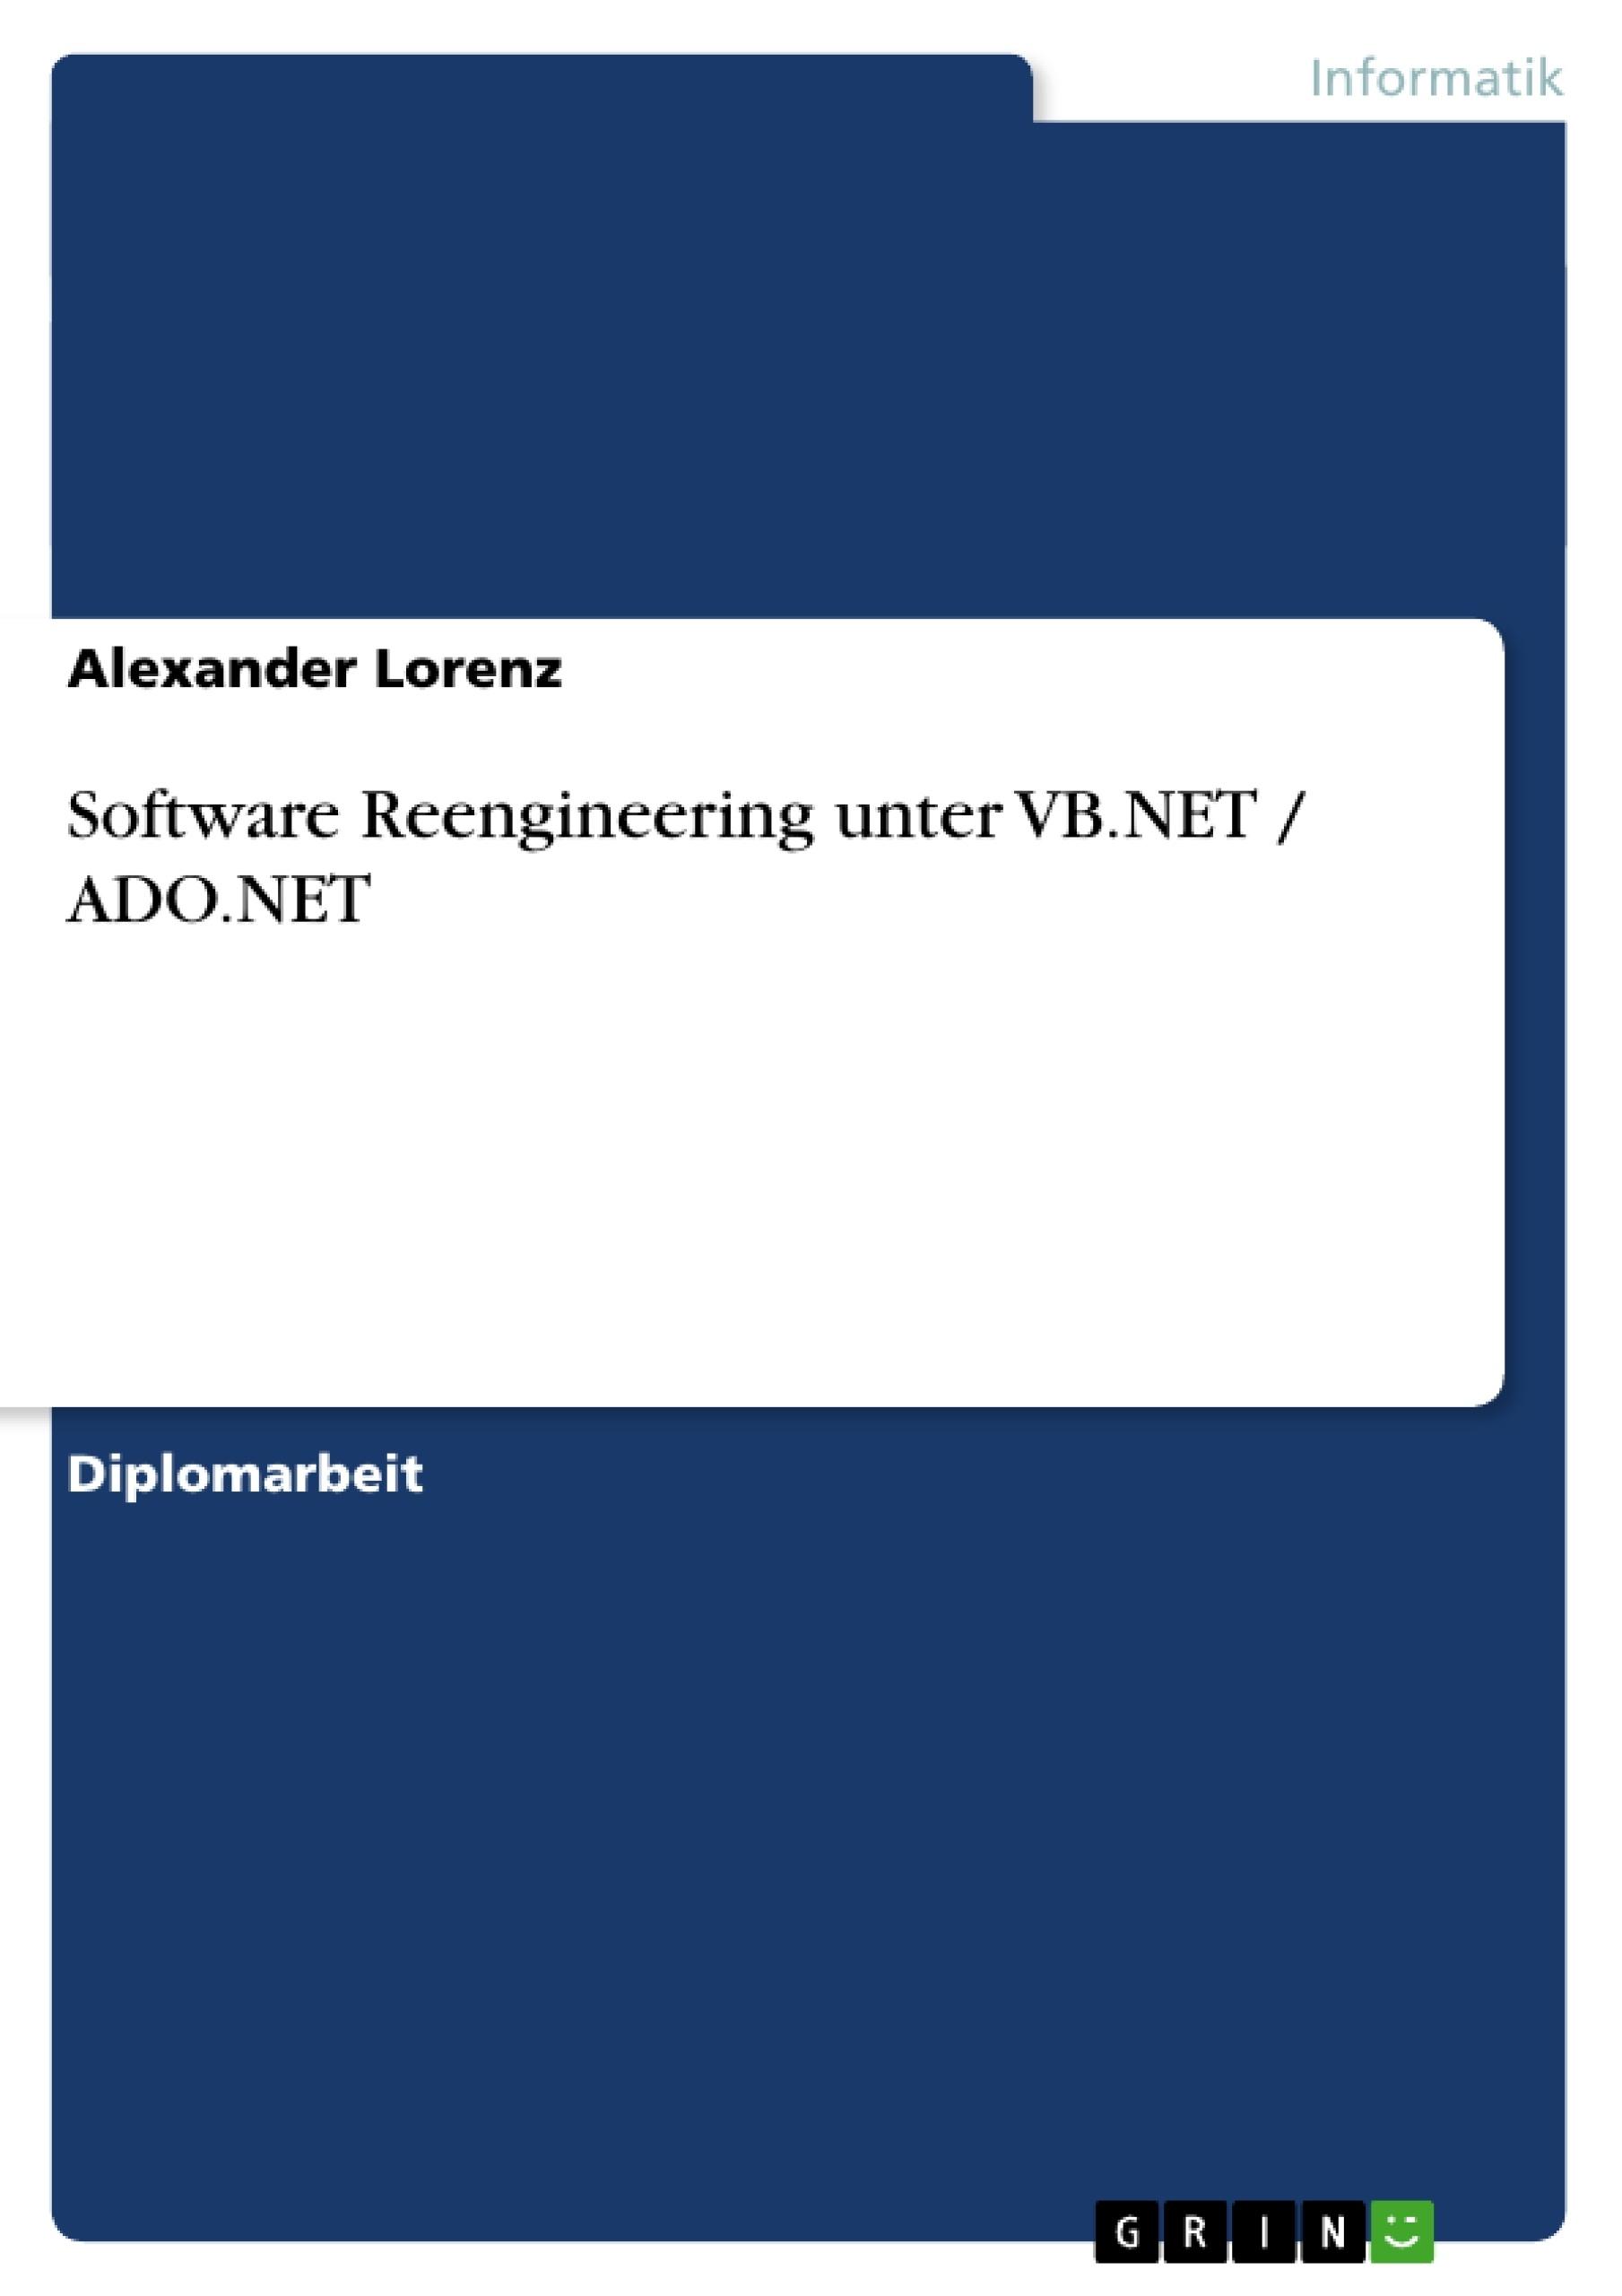 Titel: Software Reengineering unter VB.NET / ADO.NET